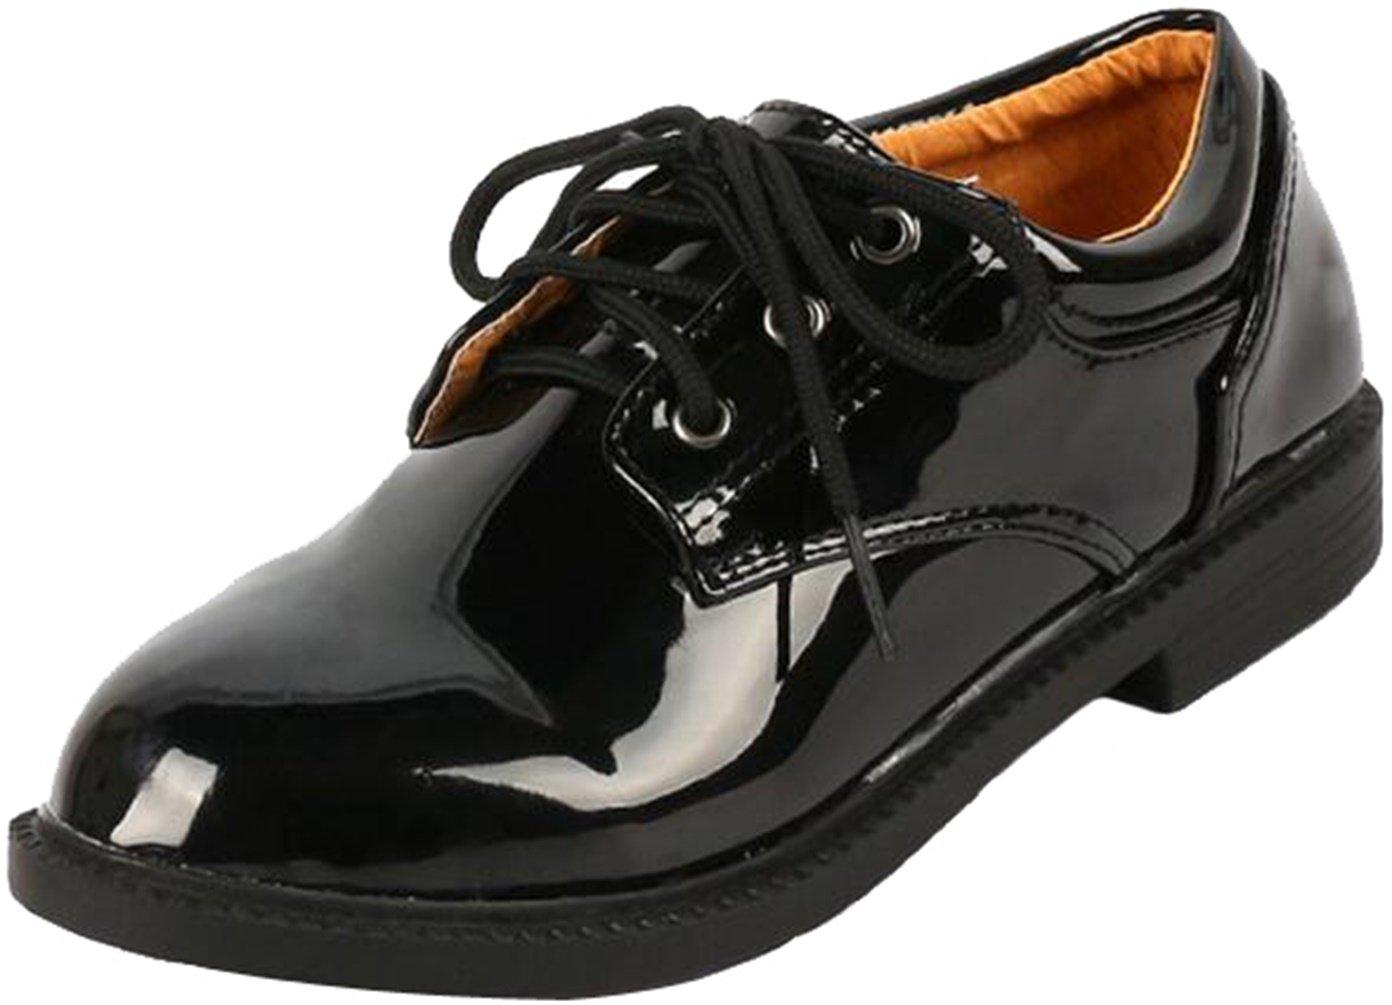 PPXID Boy's Student's British Style Performance Uniform Shoes Dress Oxford Shoes-Black 3 US Size